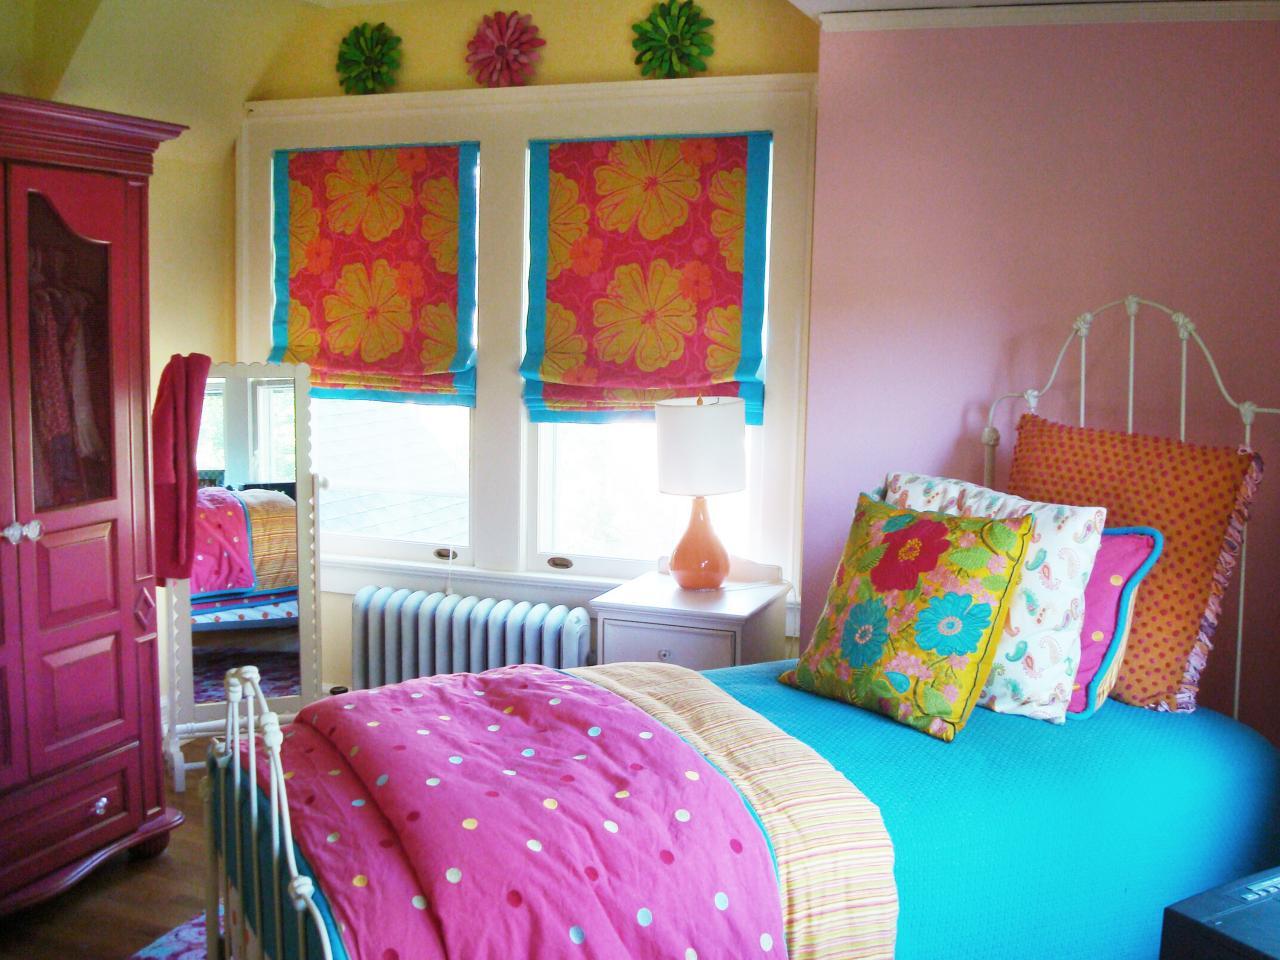 Decoraci n de dormitorios juveniles paso a paso hoy lowcost - Decoraciones para dormitorios juveniles ...